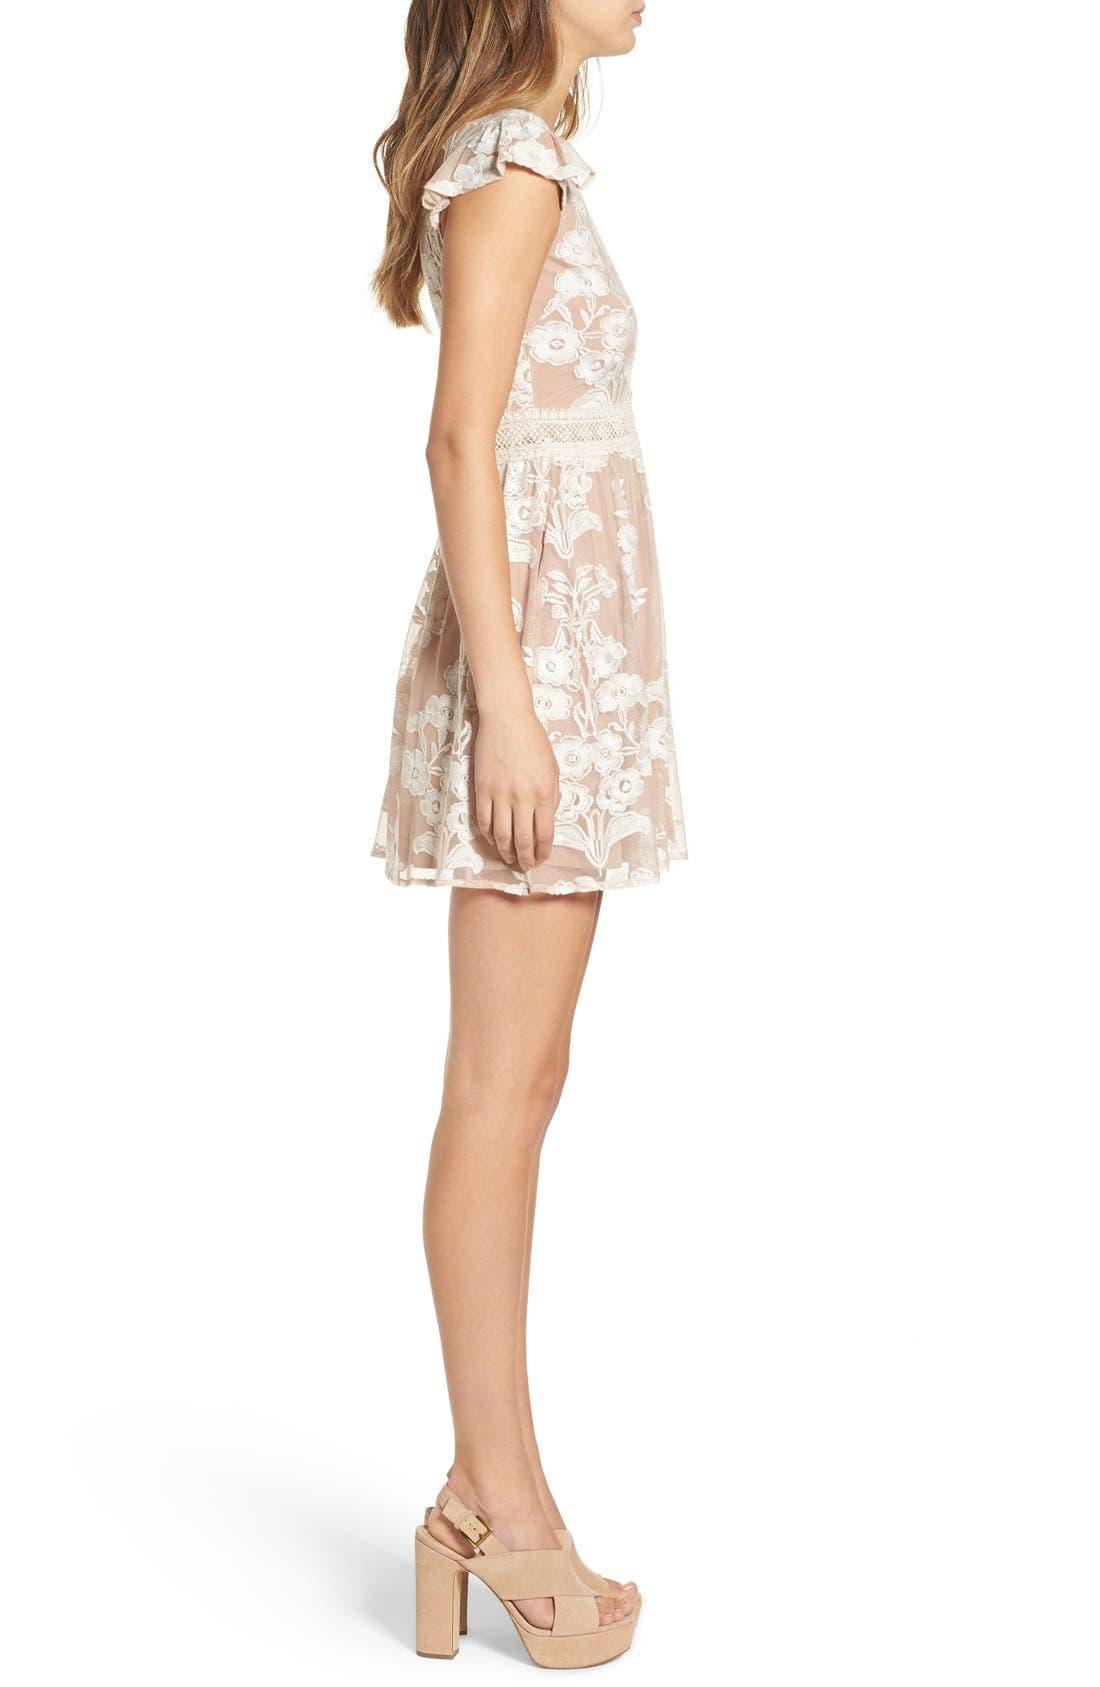 Alternate Image 4  - For Love & Lemons x Nordstrom 'Salud' Embroidered Mesh Minidress (Nordstrom Exclusive)